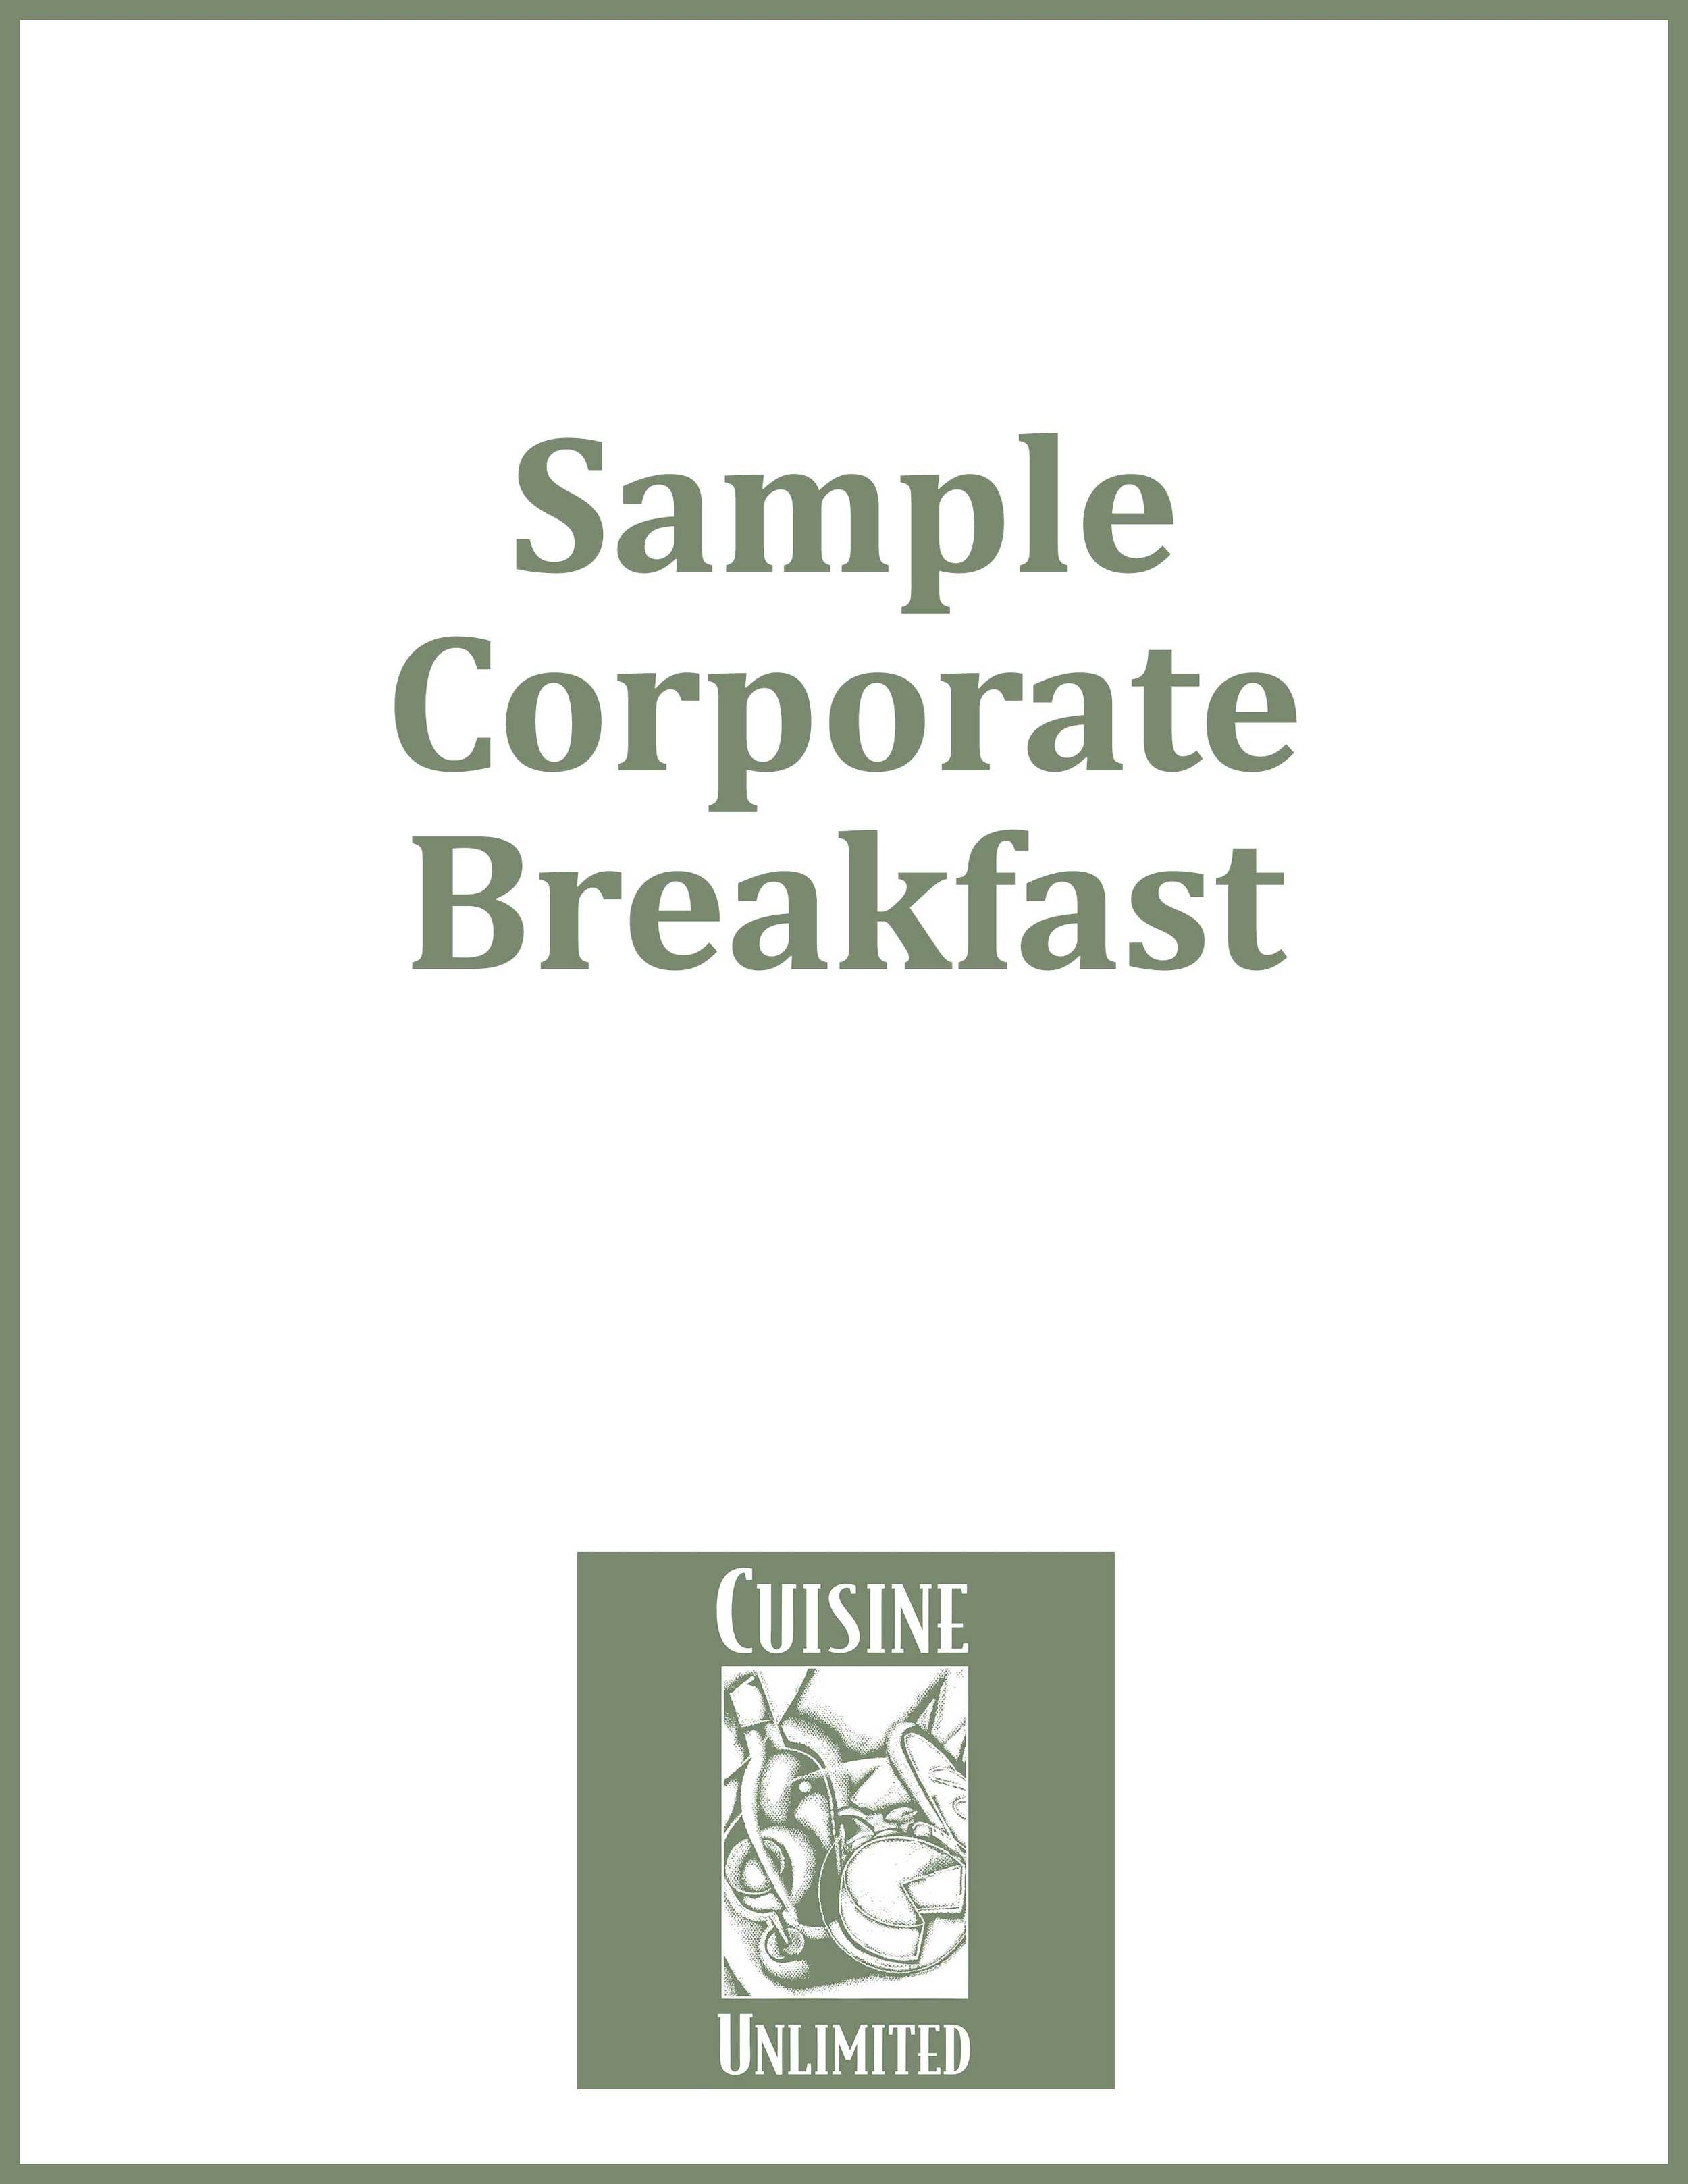 Sample Corporate Breakfast